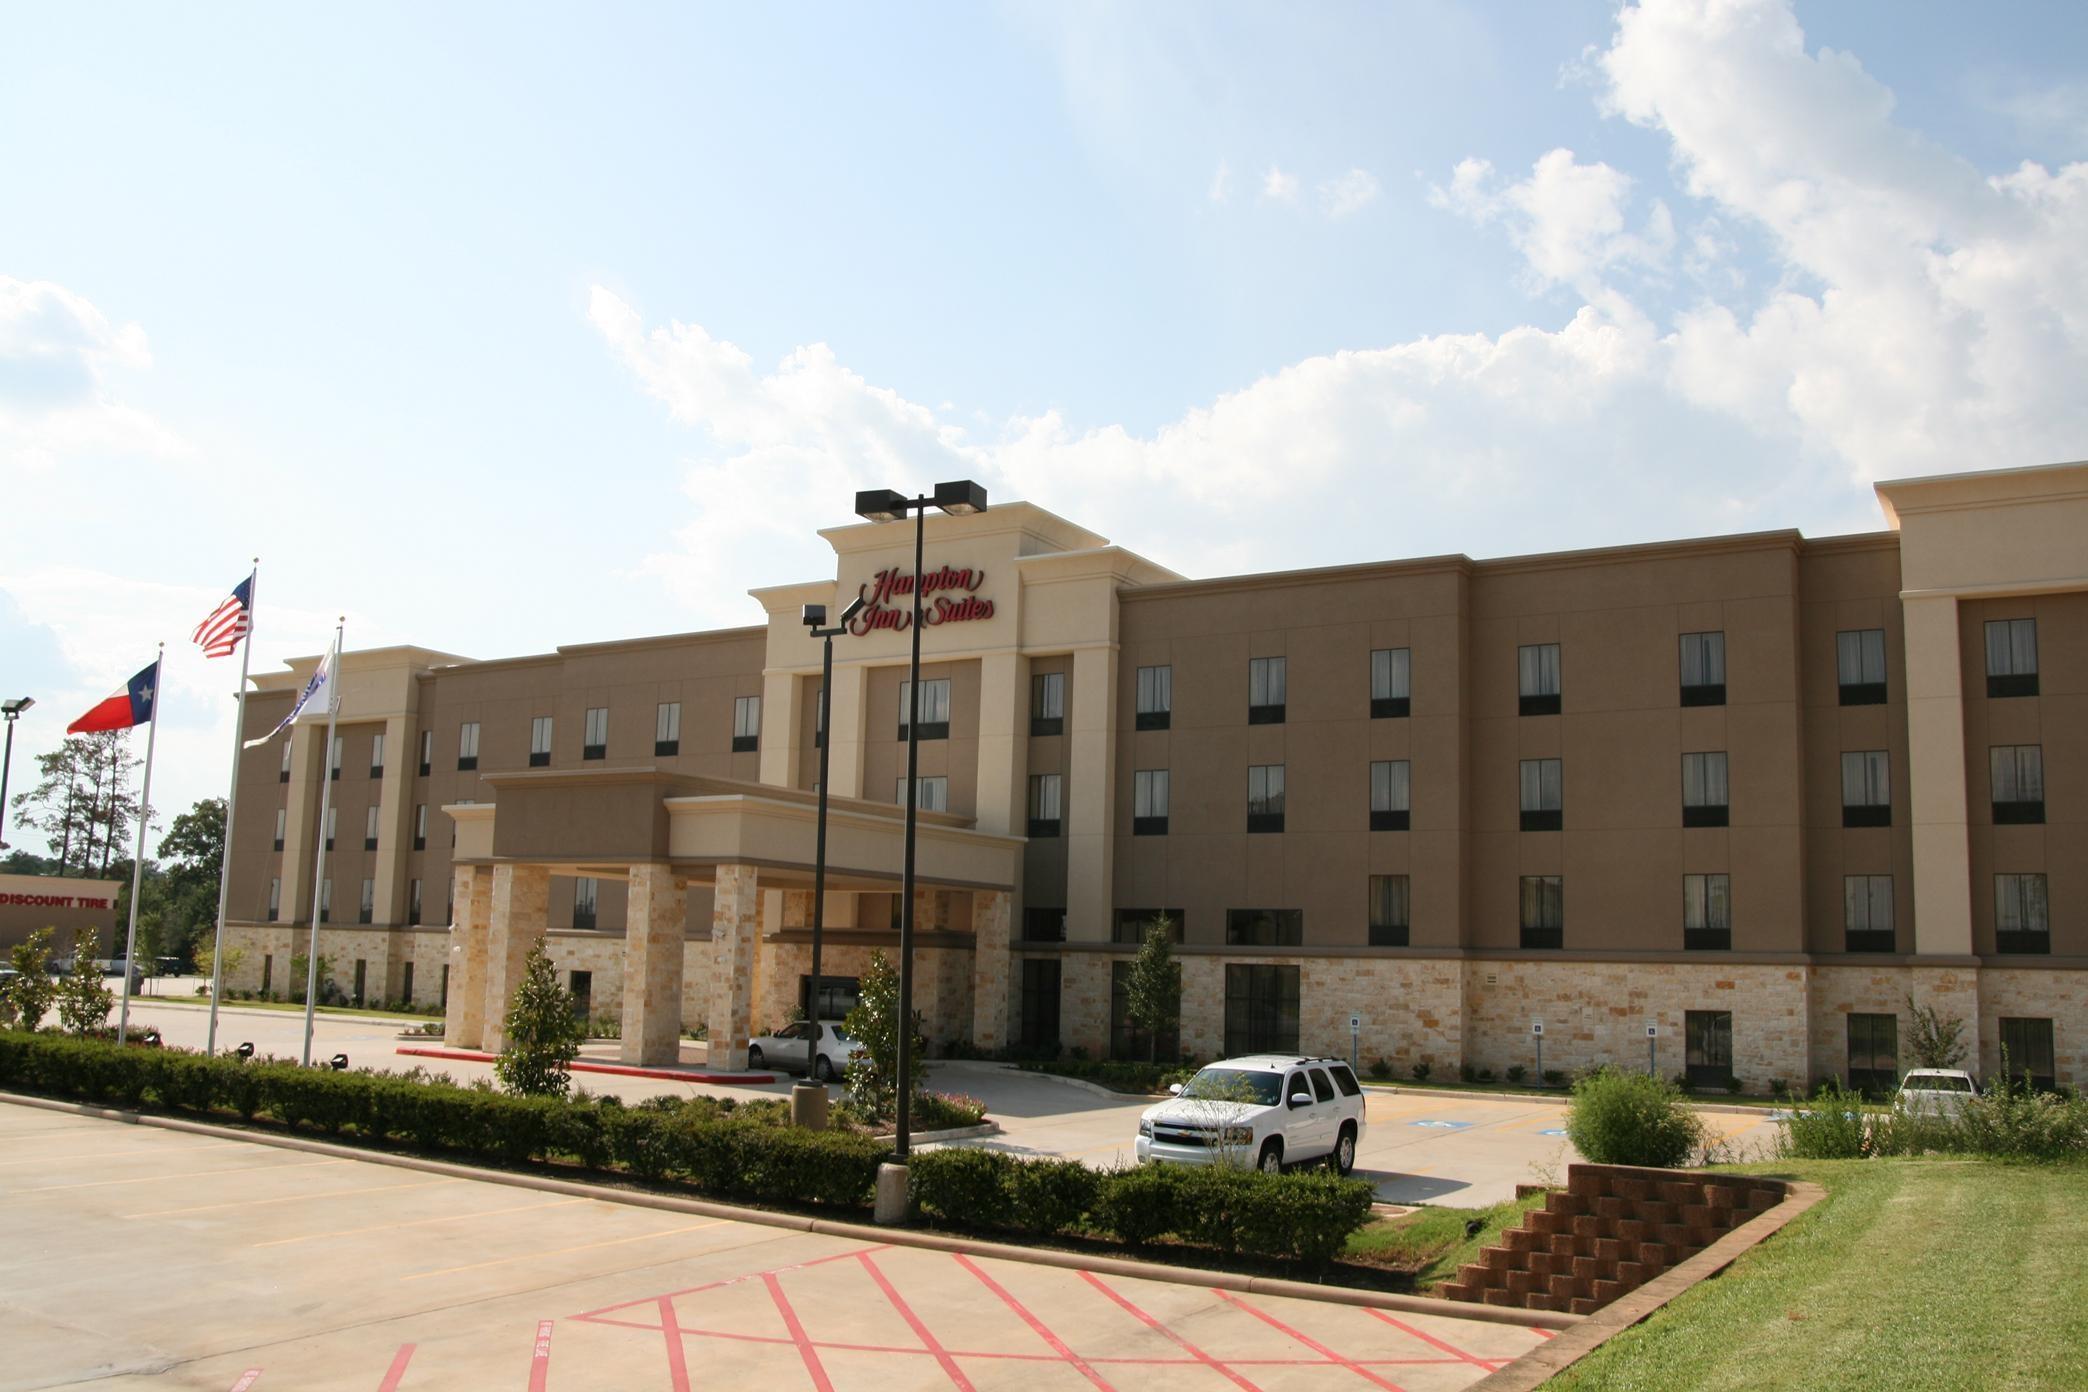 Hampton Inn & Suites Conroe - I-45 North image 0